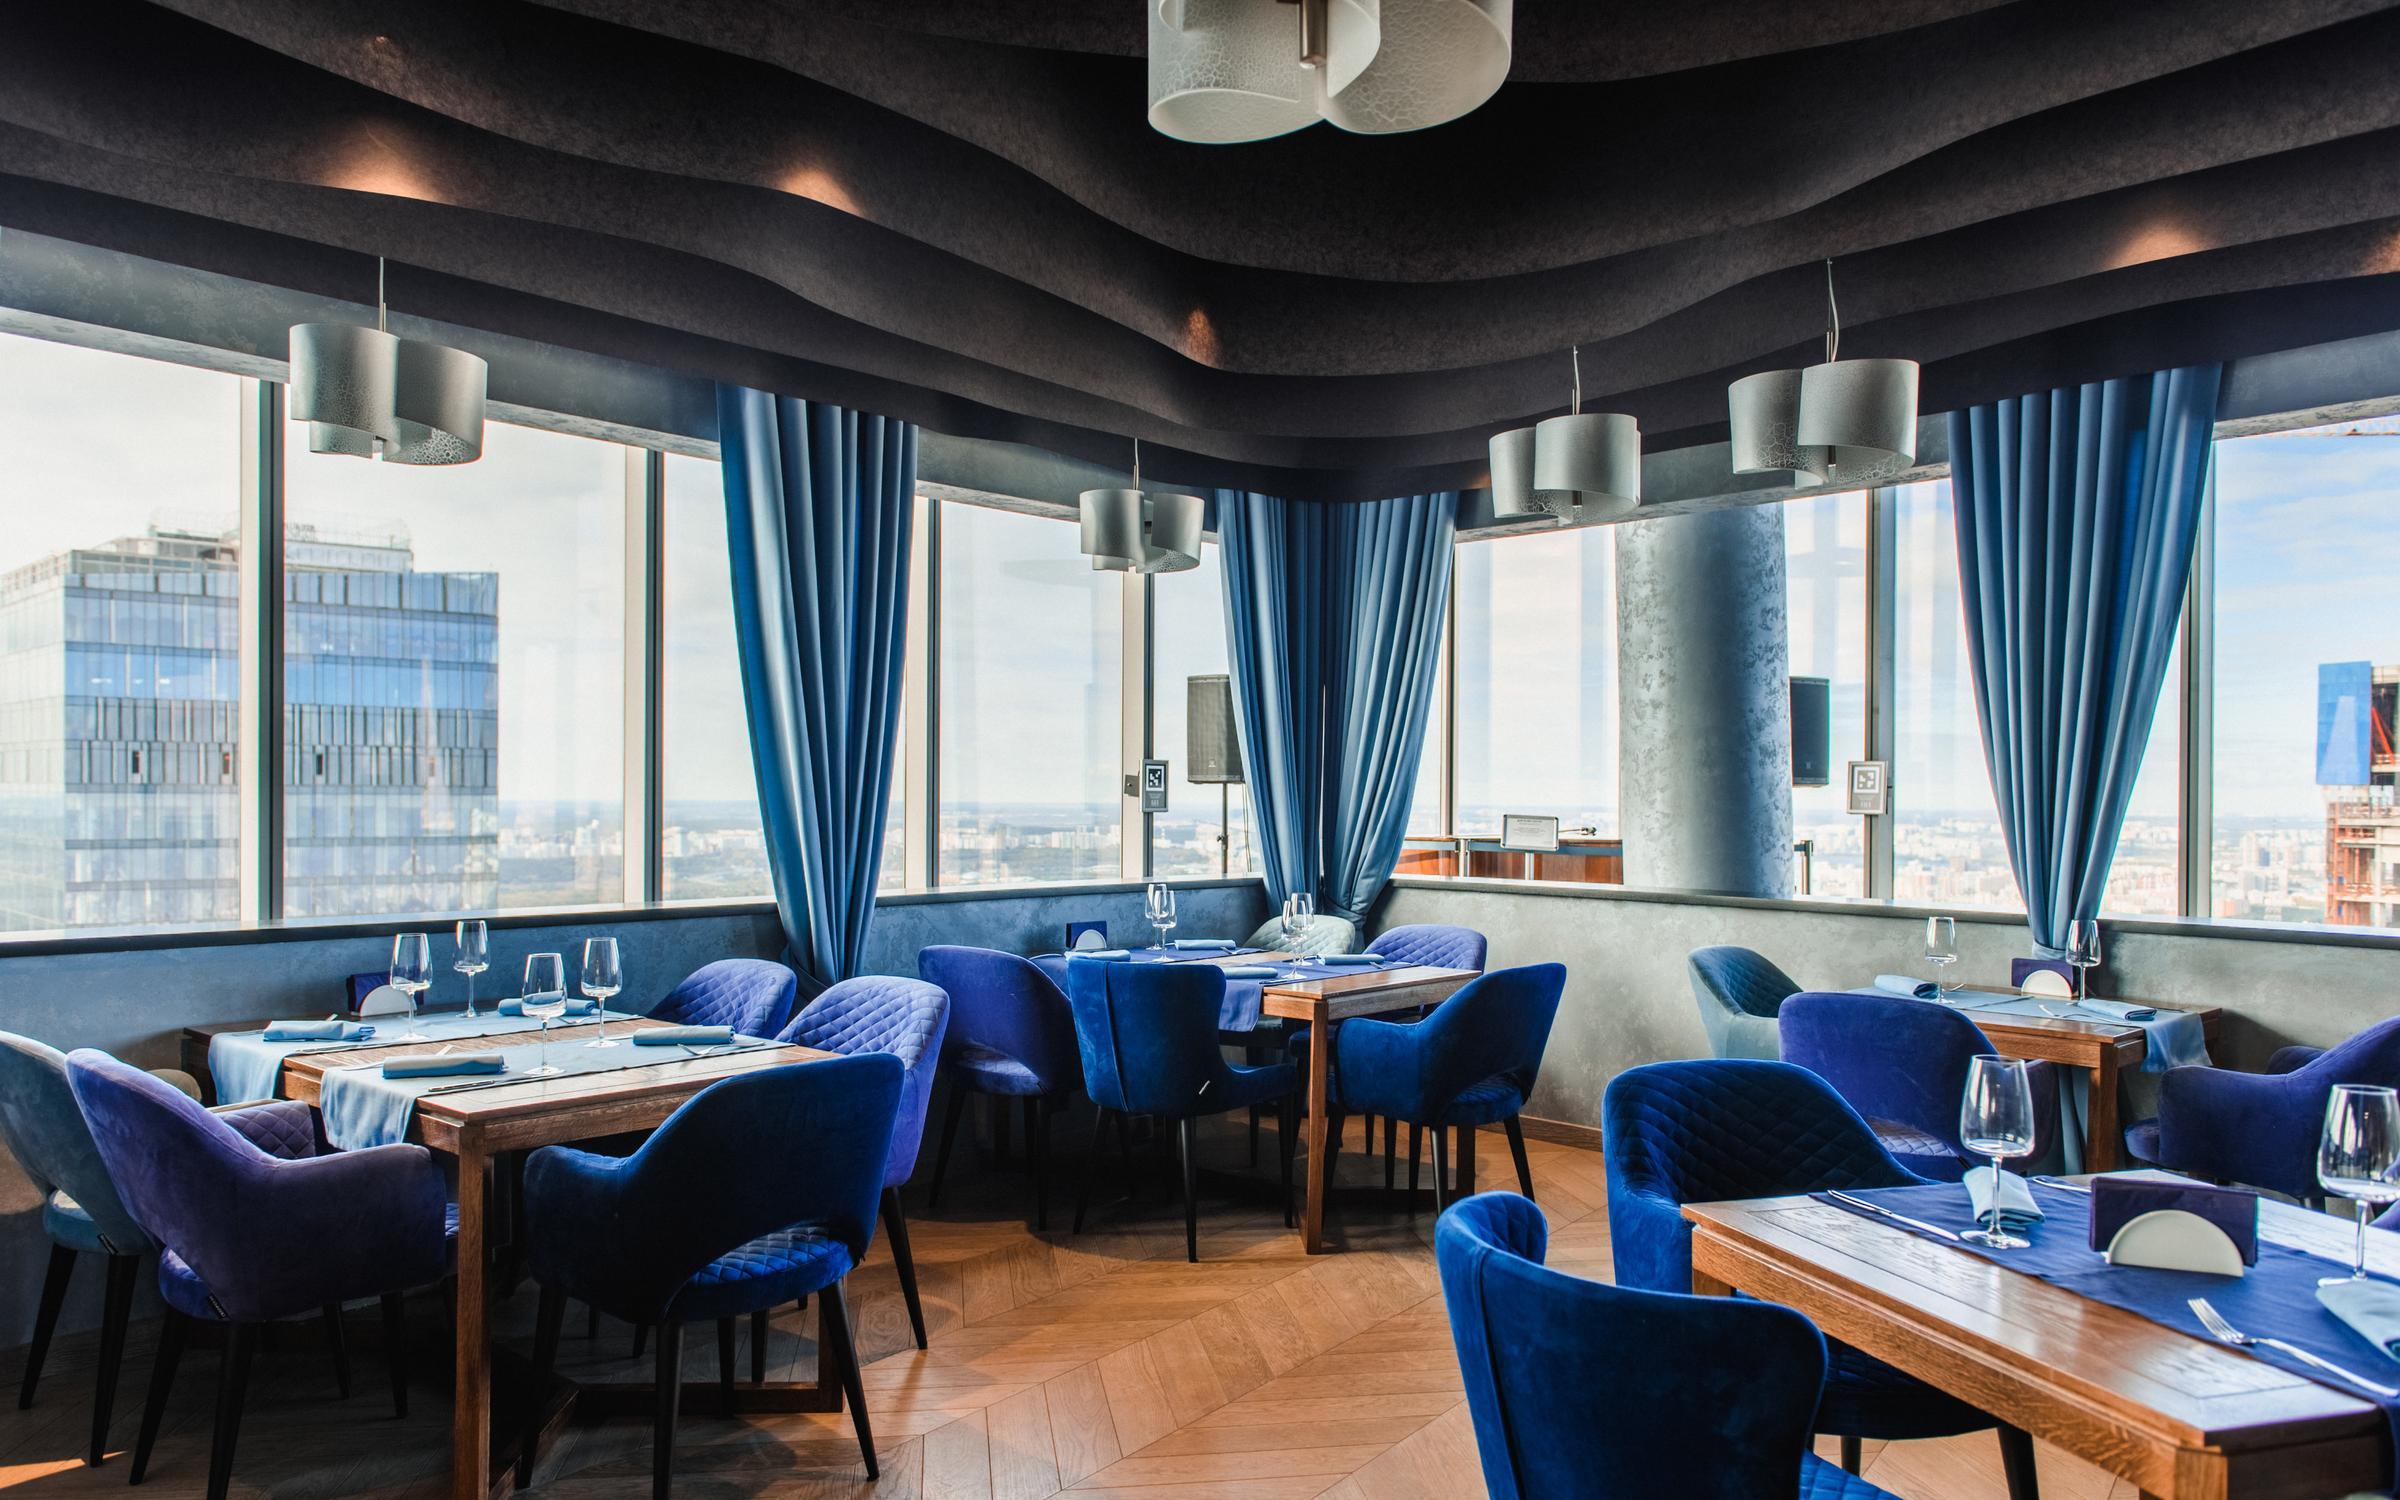 фотография Ресторана 360 в ТЦ Башня Федерация